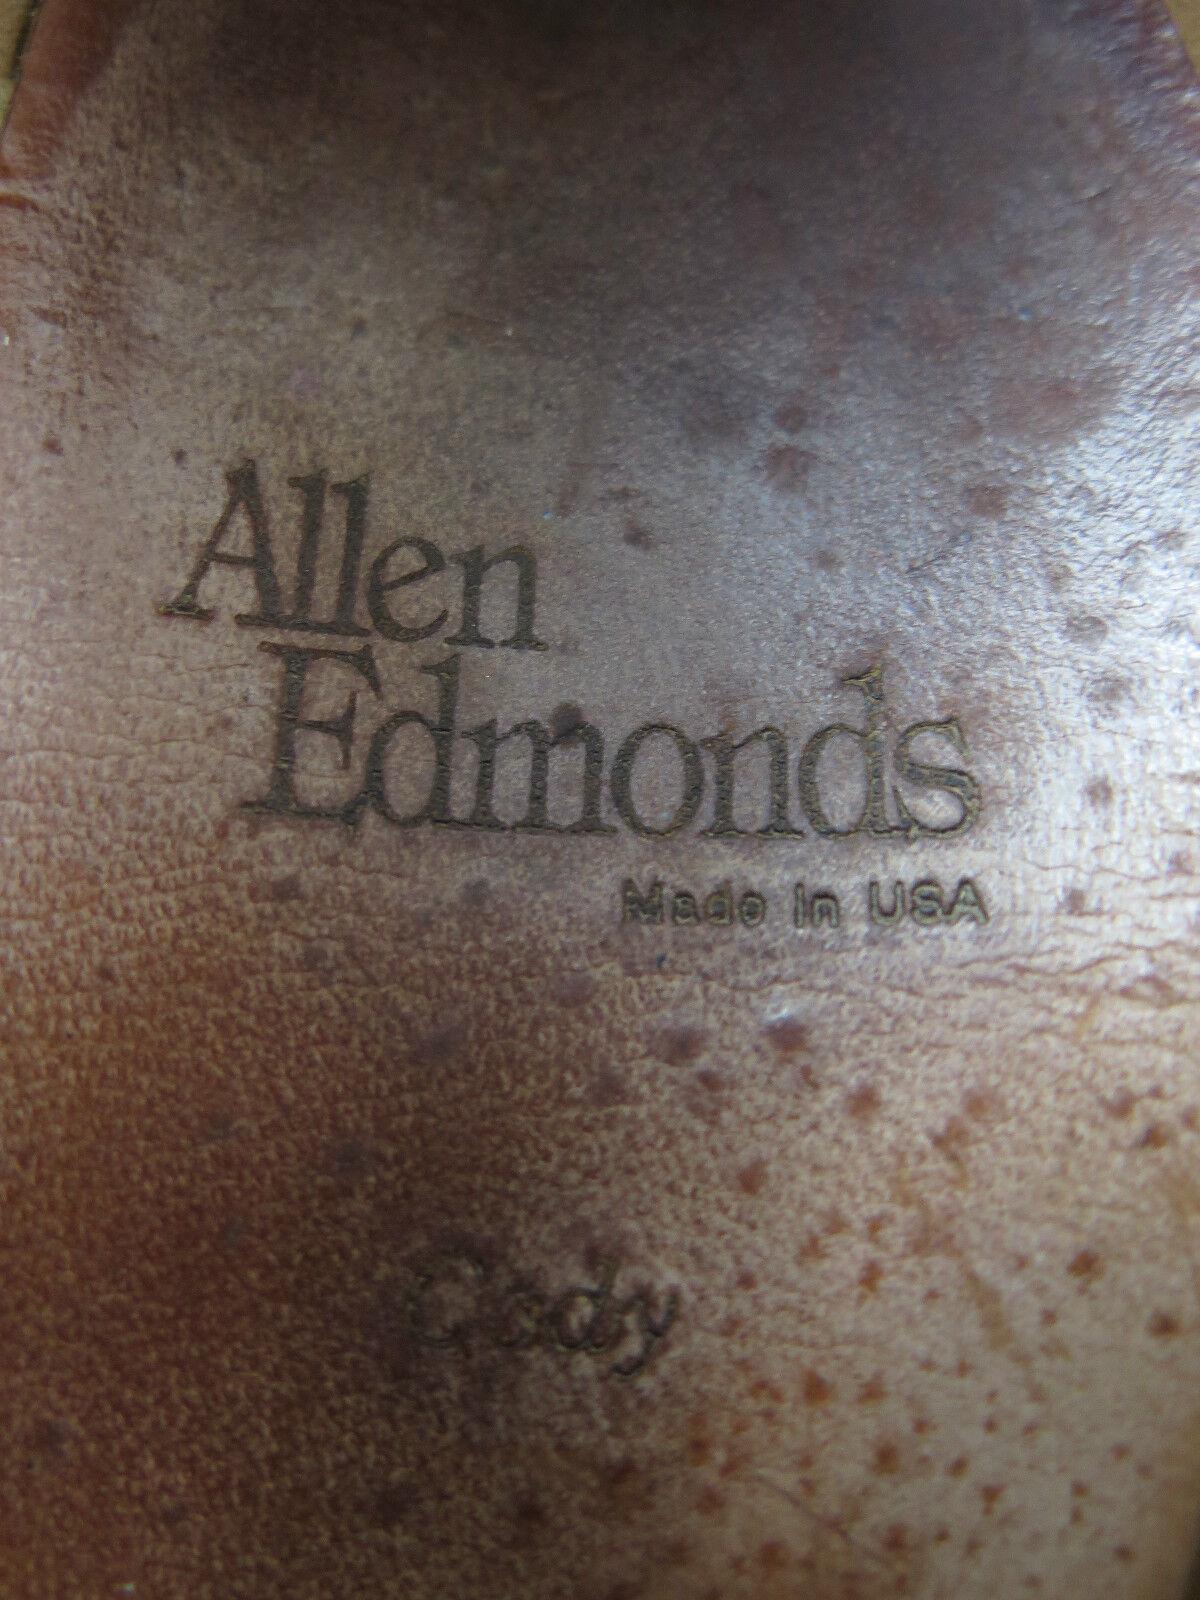 Allen Edmonds Cody Marrón Leather Weave Tassels Loafers Dress Zapatos 1/2 9 1/2 Zapatos D USA d34b1d